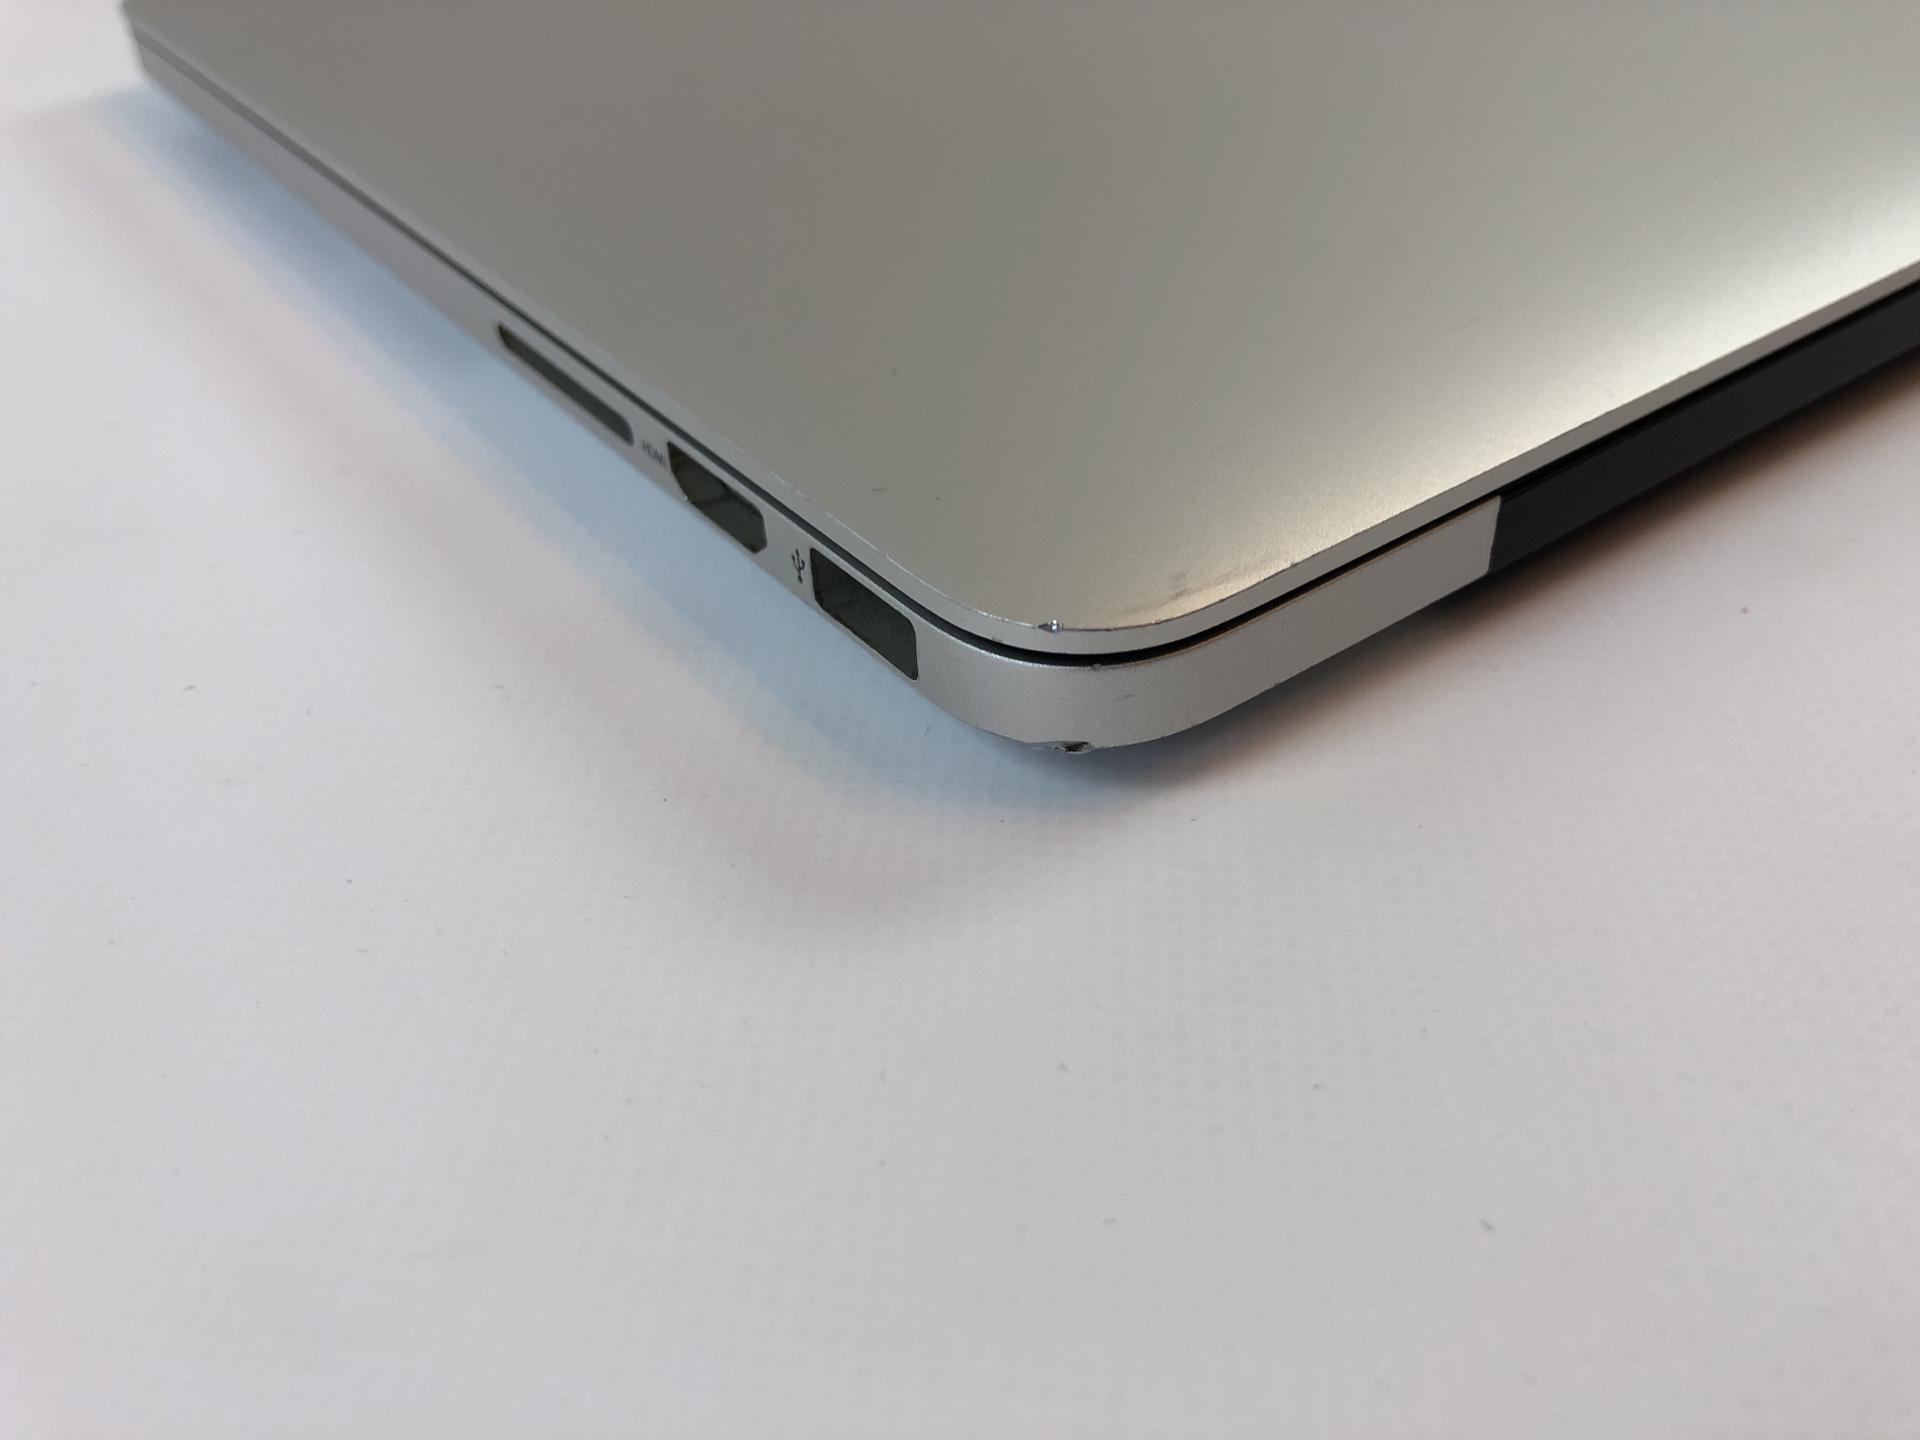 "MacBook Pro Retina 13"" Late 2013 (Intel Core i7 2.8 GHz 16 GB RAM 512 GB SSD), Intel Core i7 2.8 GHz, 16 GB RAM, 512 GB SSD, bild 3"